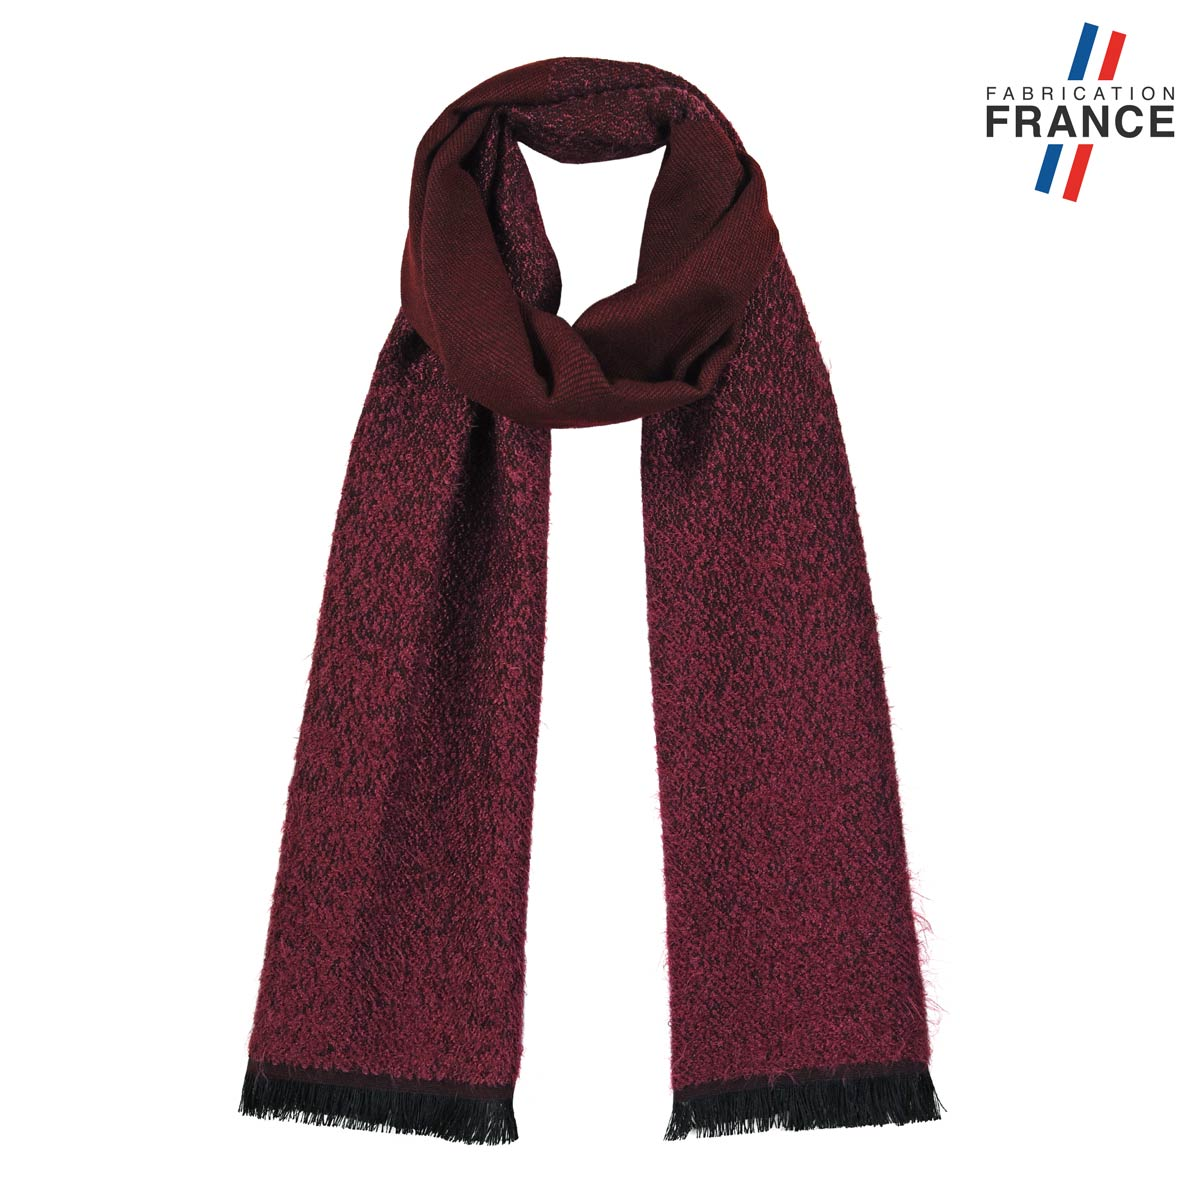 AT-05750_F12-1FR_Echarpe-prune-pilou-fabriquee-en-france